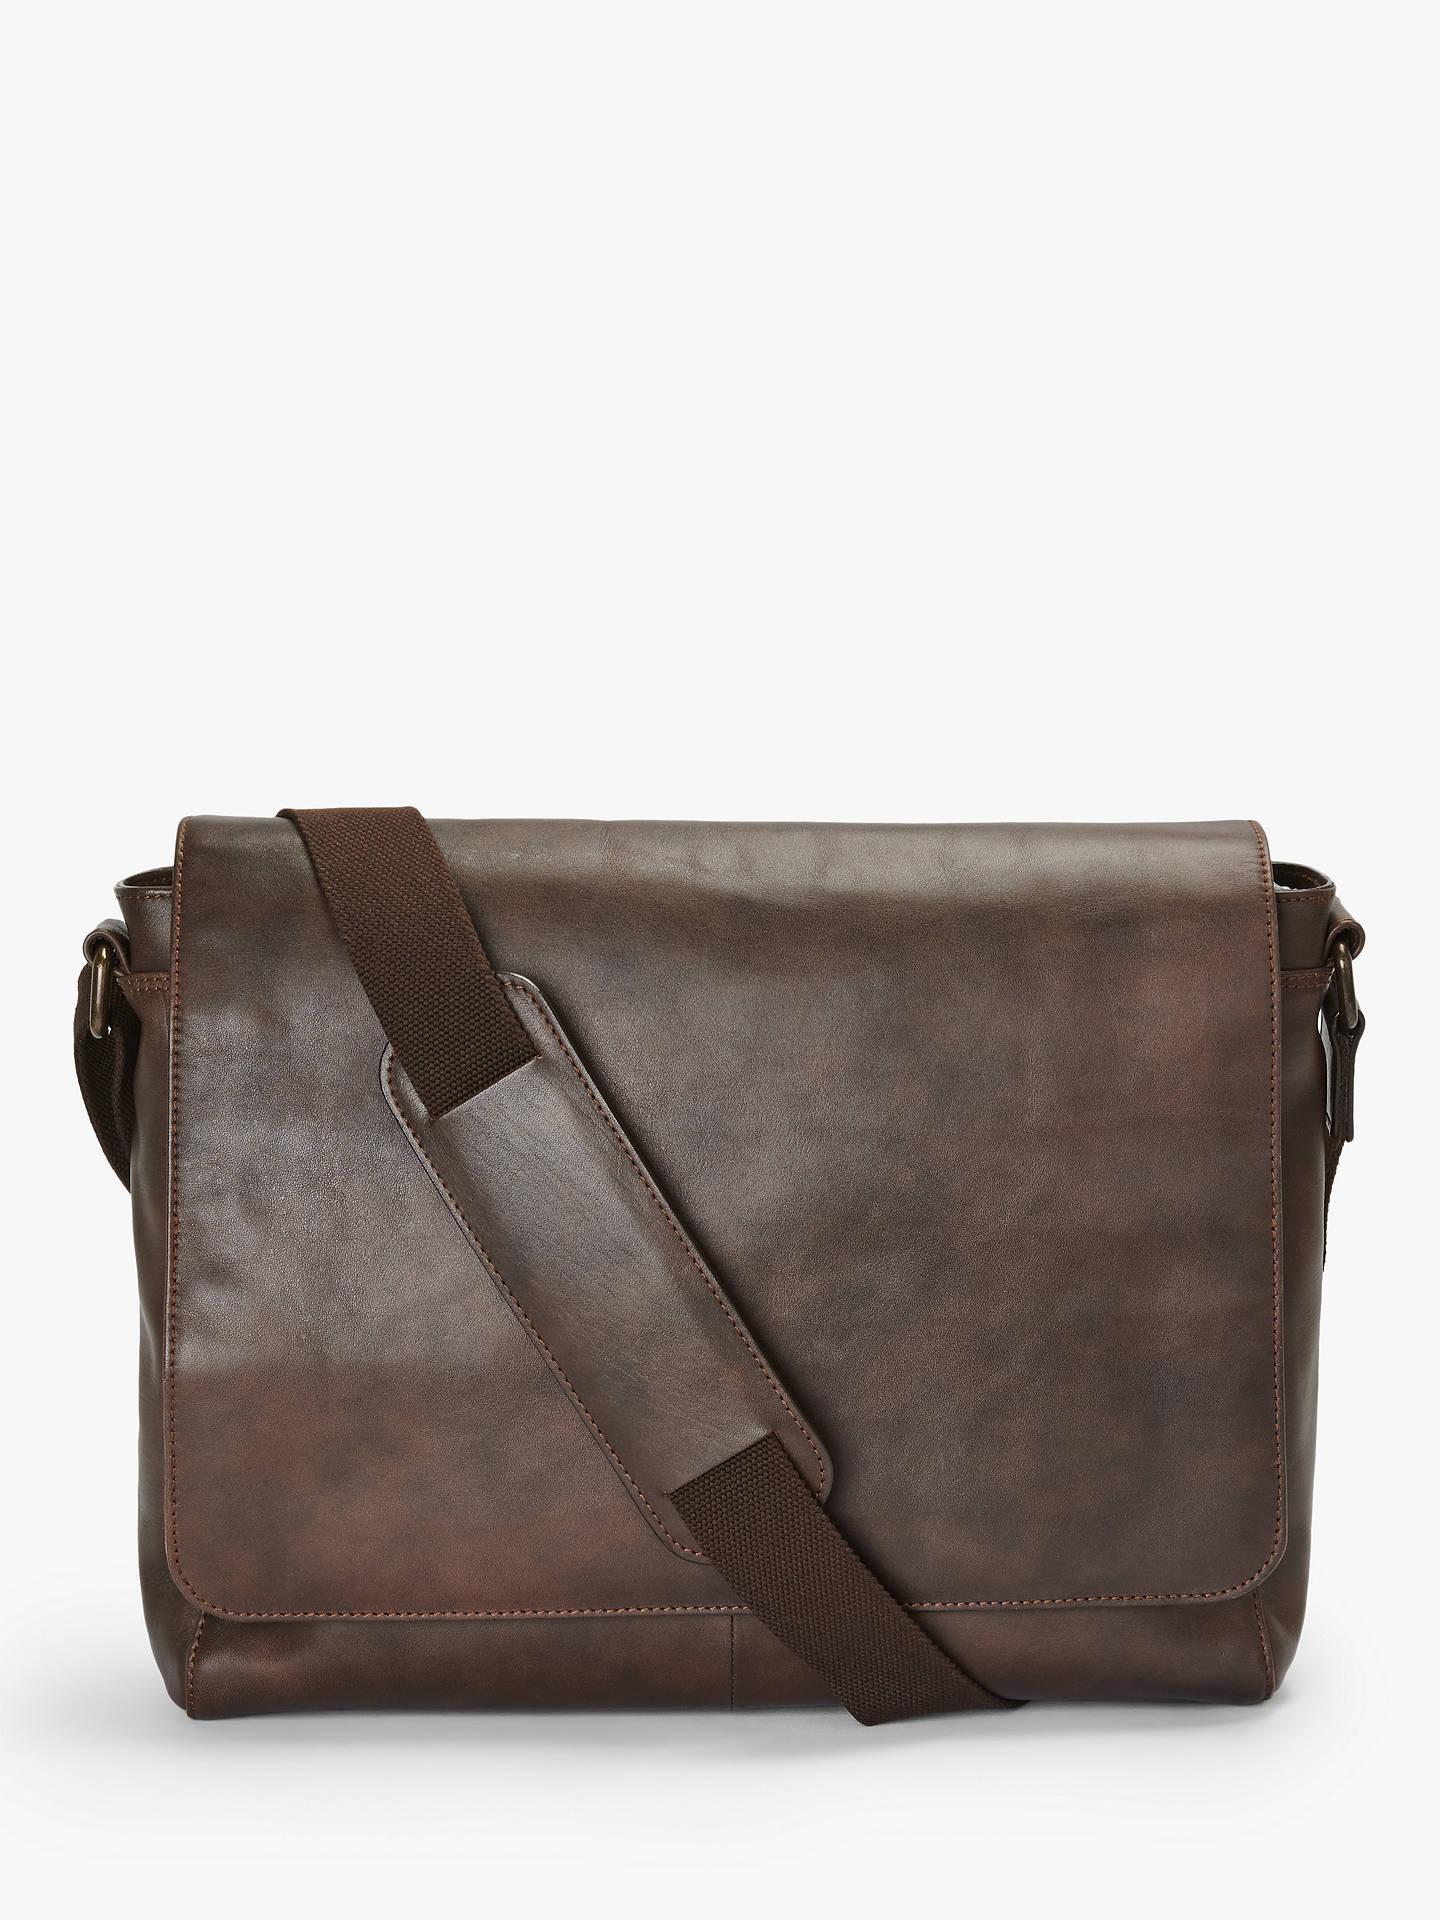 6de75e331616 John Lewis & Partners Edinburgh Leather Messenger Bag, Brown